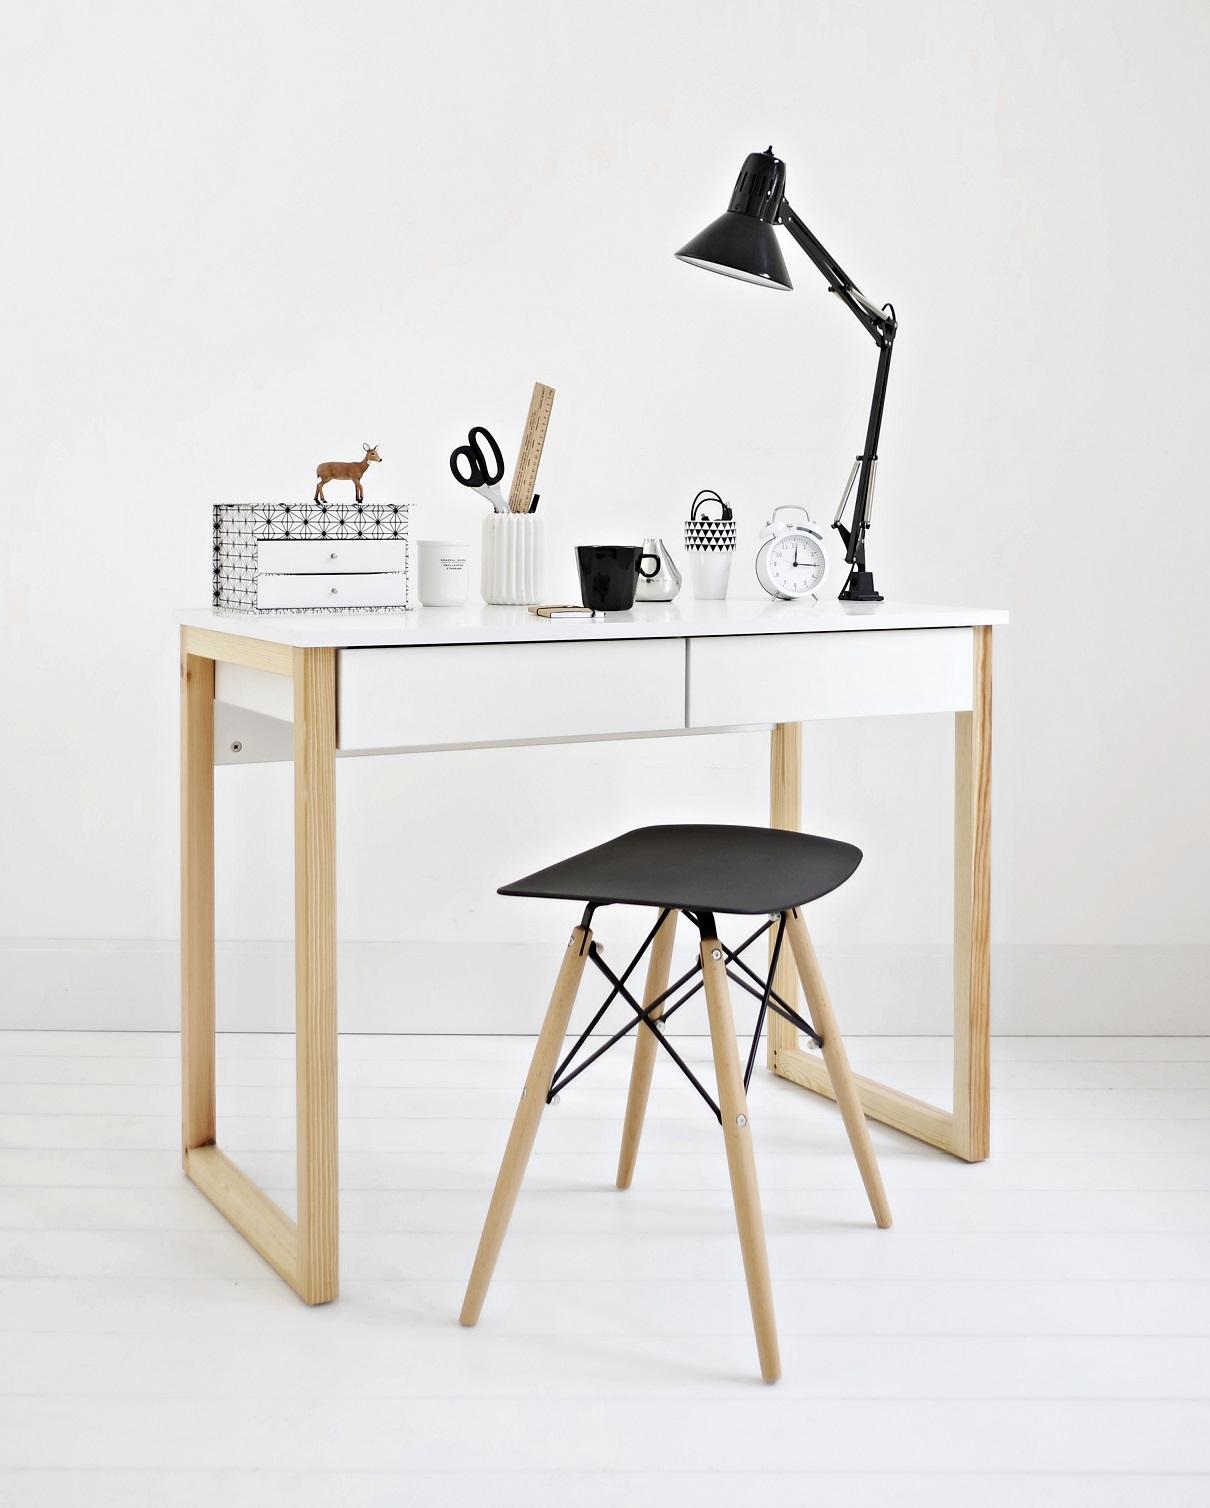 nowoczesne-biurko-des5/2-ideal-design